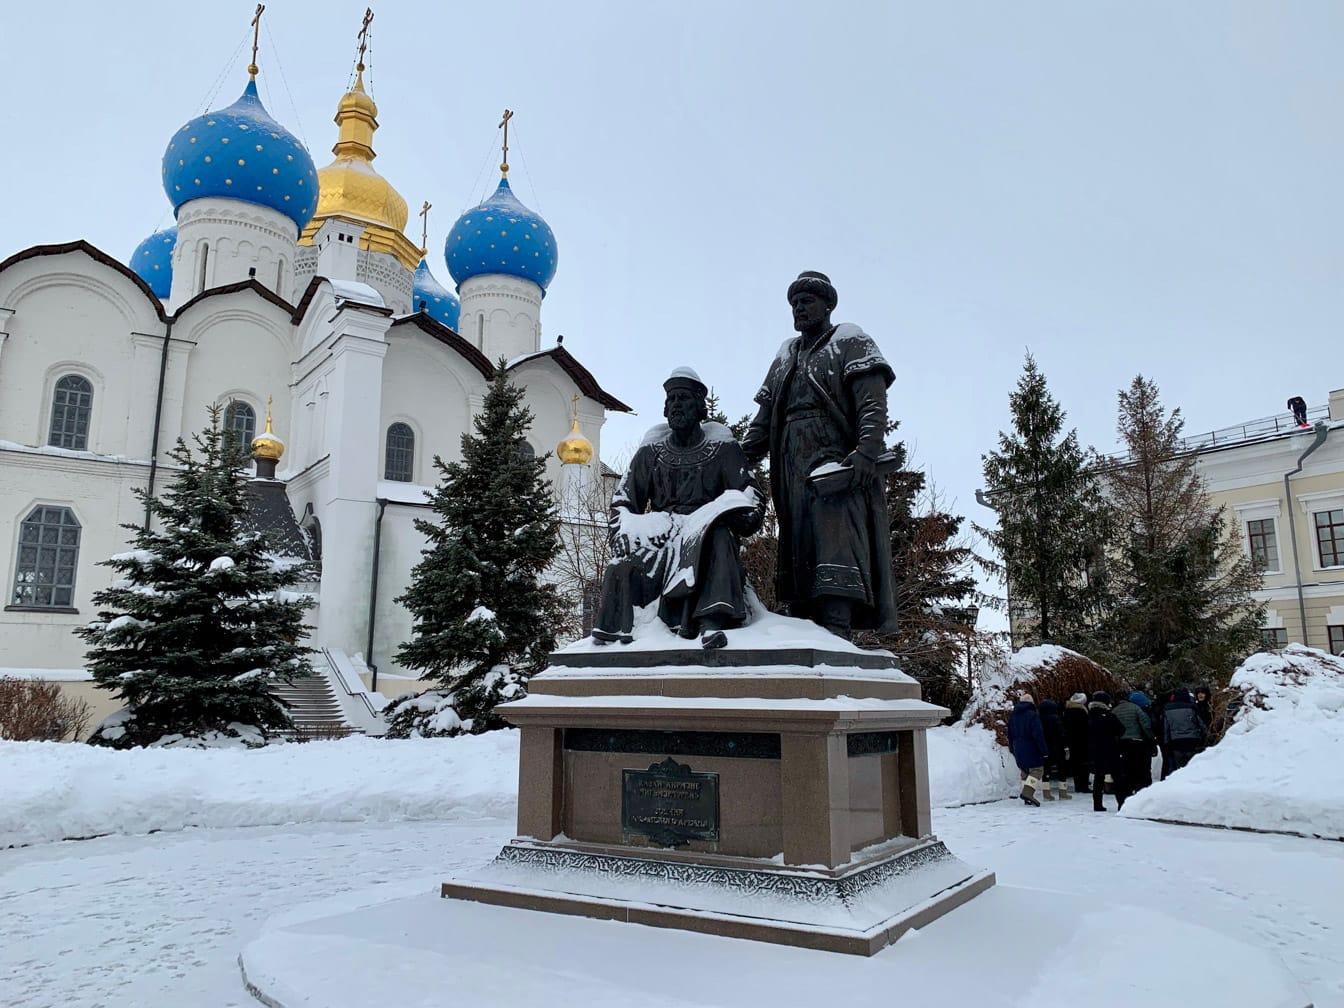 Credit timonthetrain.com - Kazan